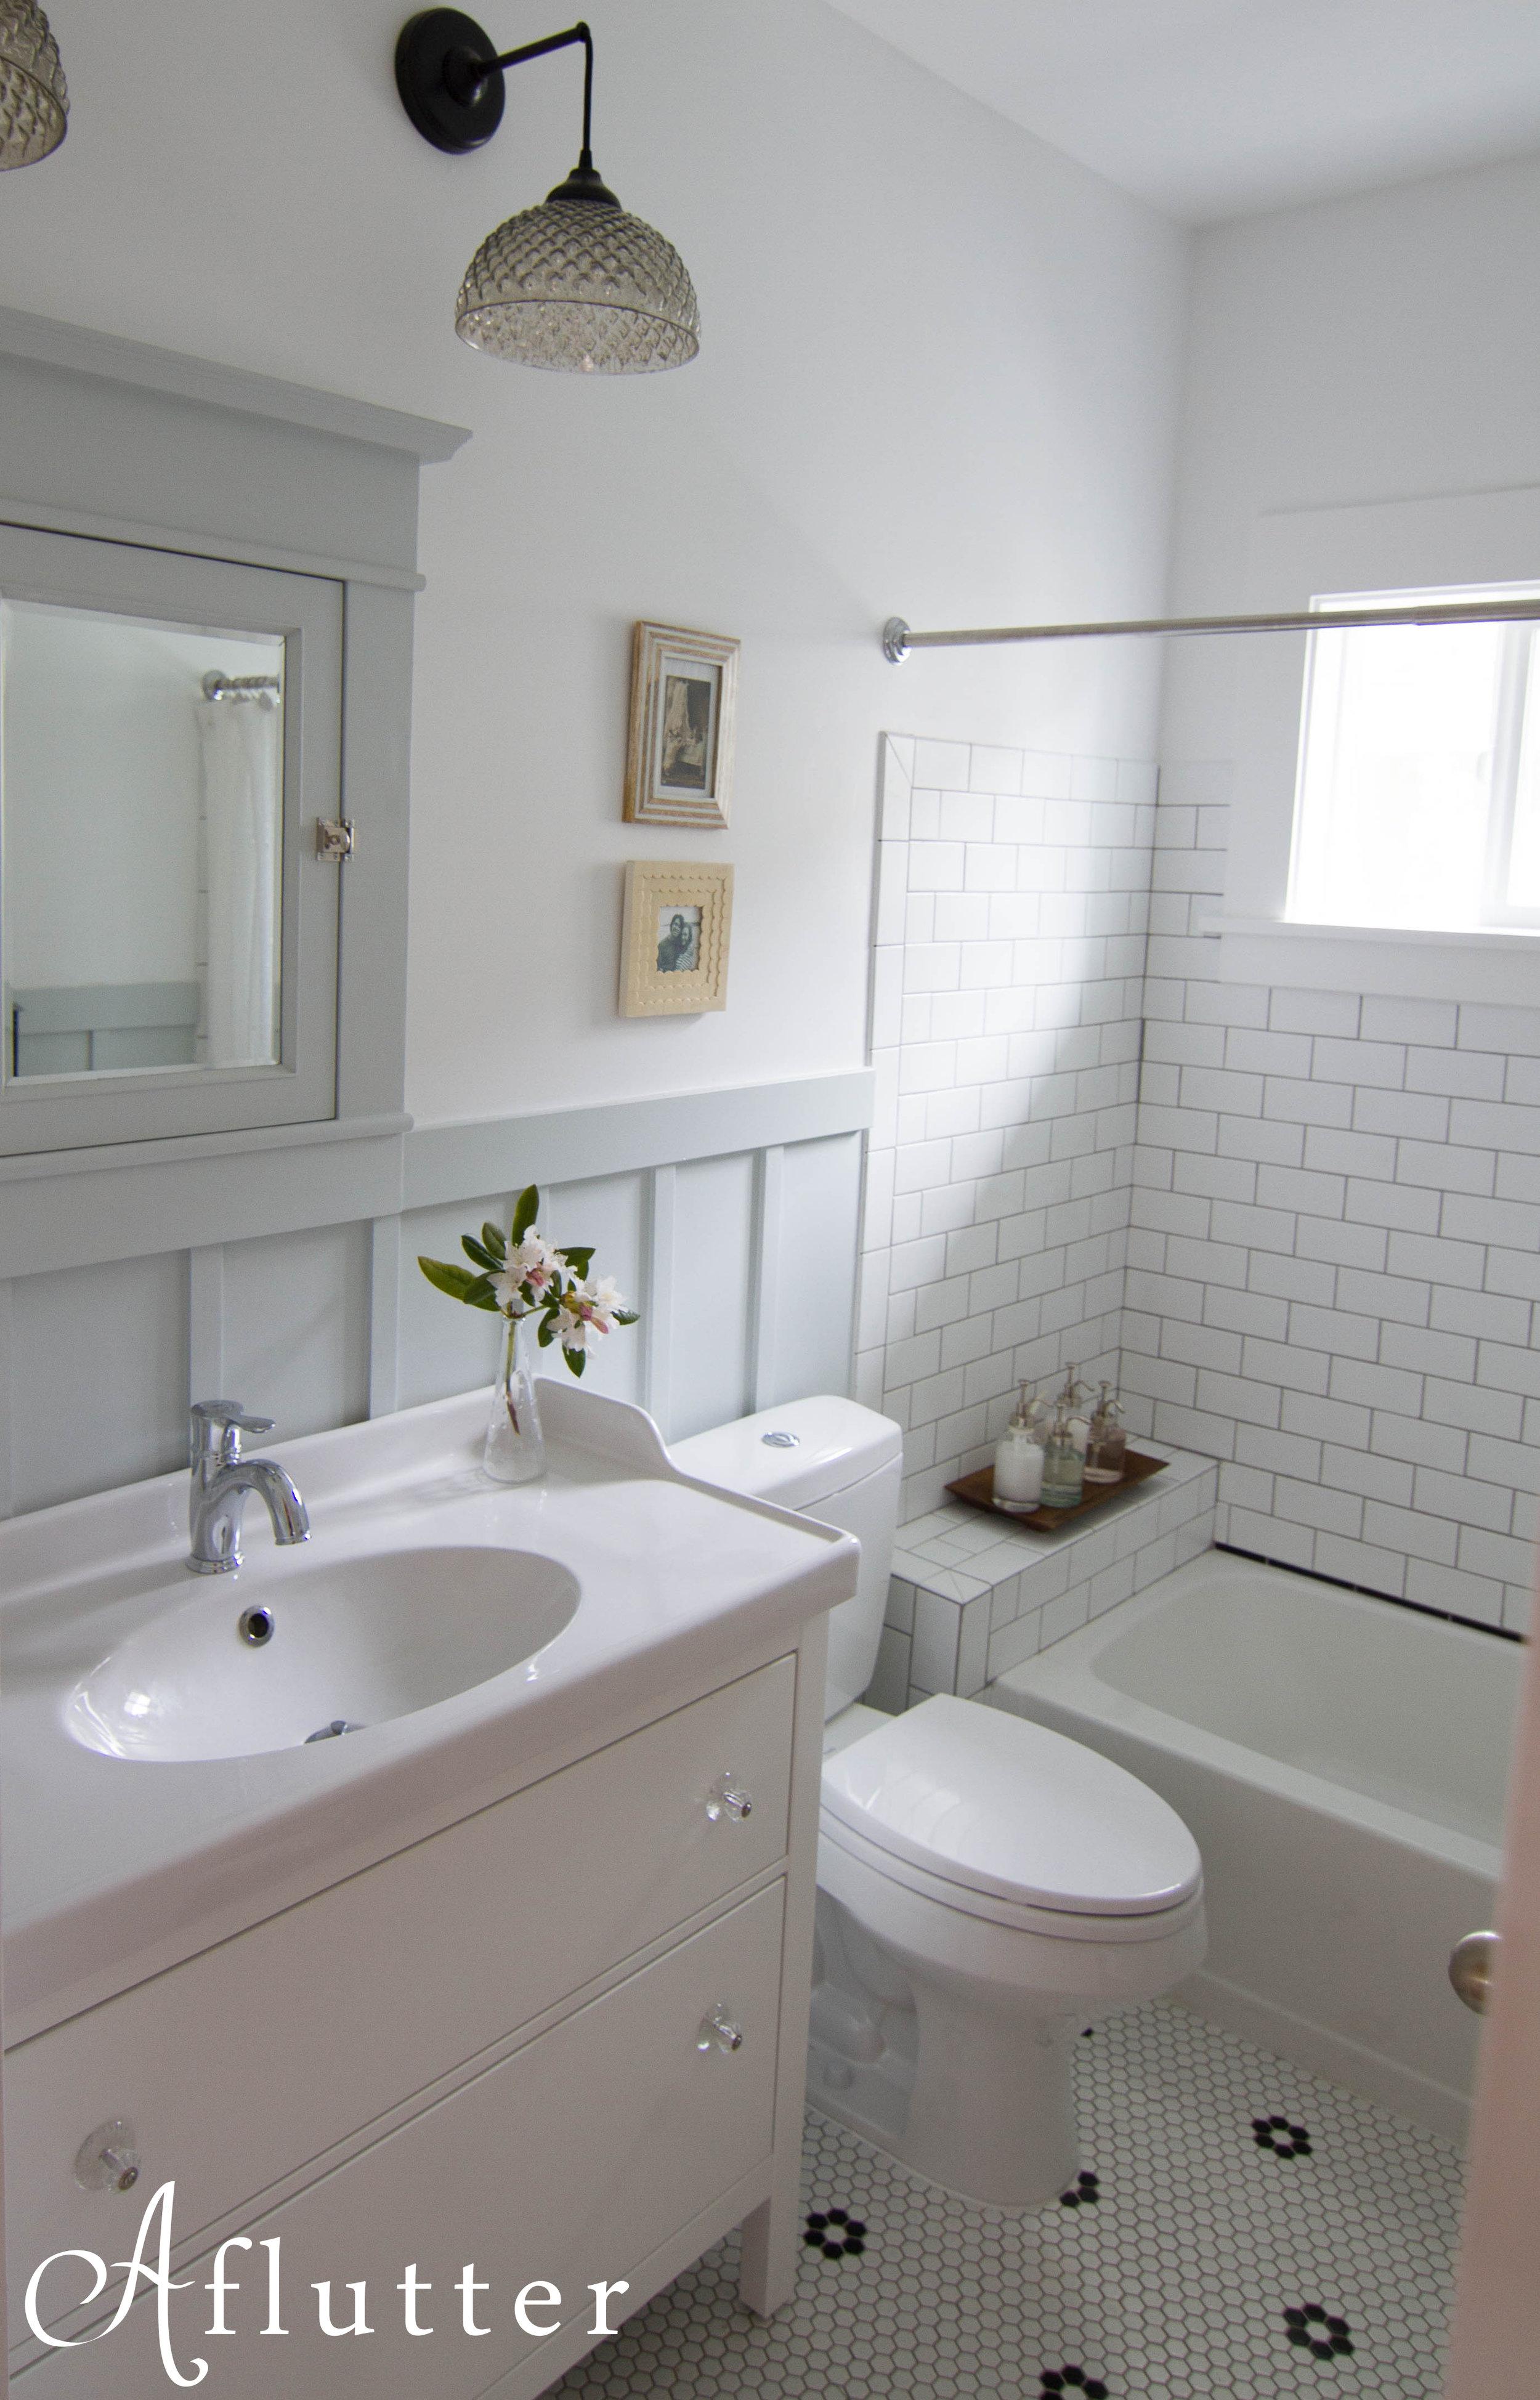 Bath-Remodel-10-of-11.jpg